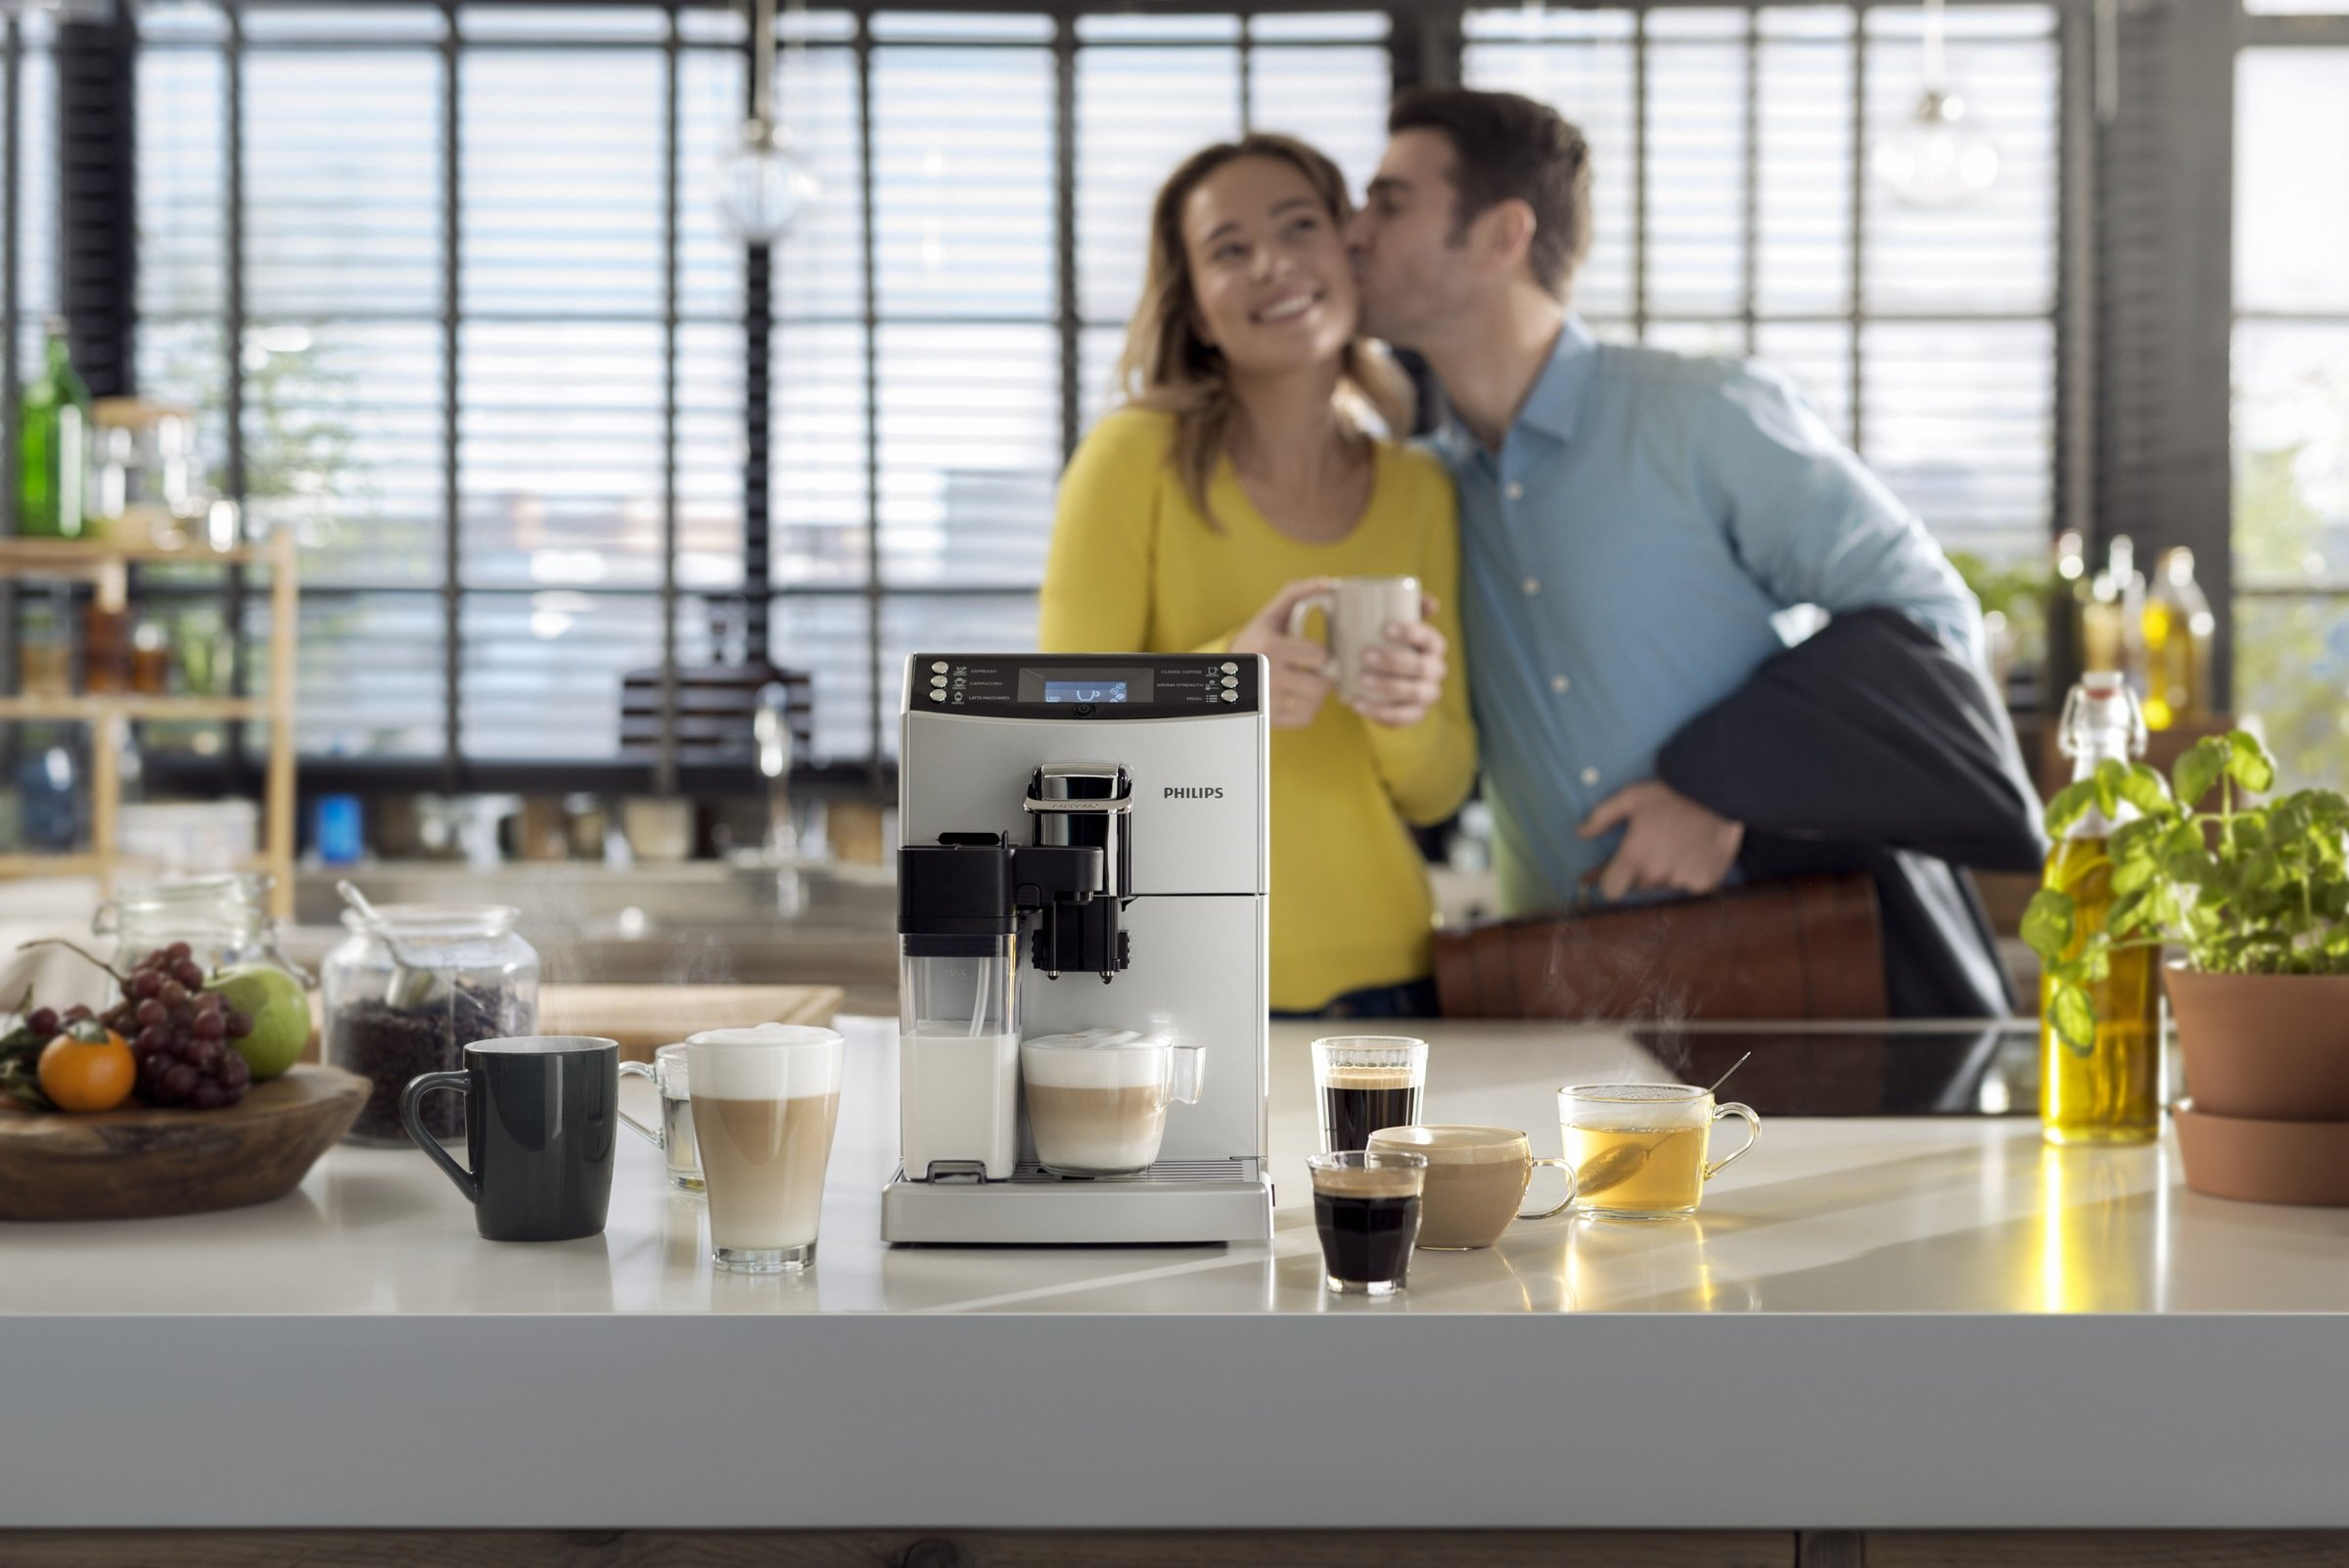 Philips-EP405010-Kaffeevollautomat-18-Liter-CoffeeSwitch-Milchkaraffe-AquaClean-silber